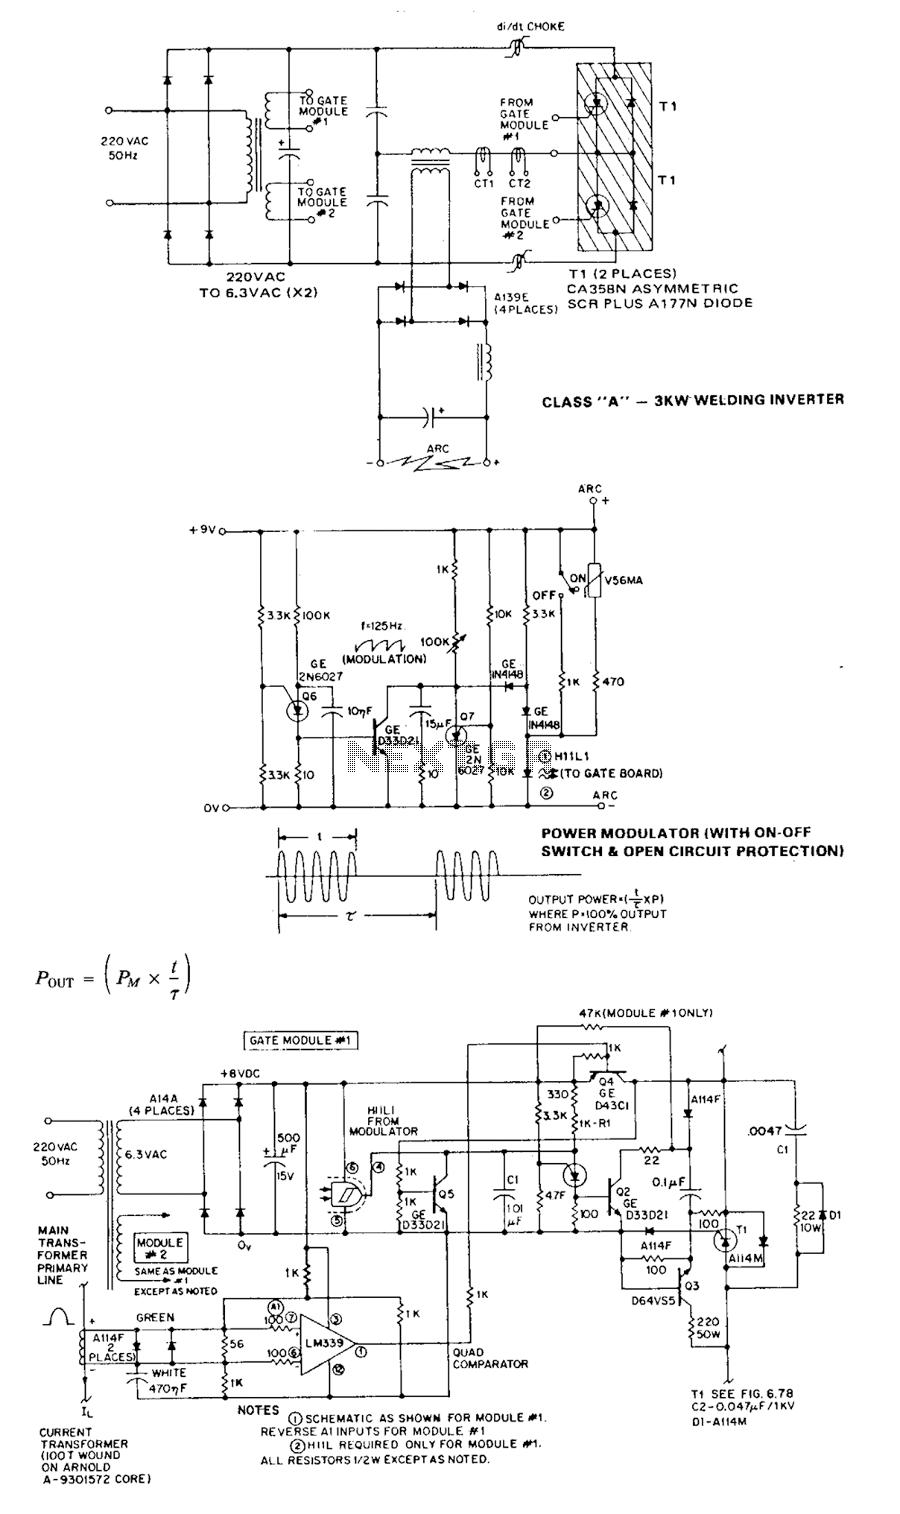 medium resolution of ultrasonic welding circuit diagram wiring diagram longultrasonic welding circuit diagram wiring diagram expert ultrasonic circuit audio